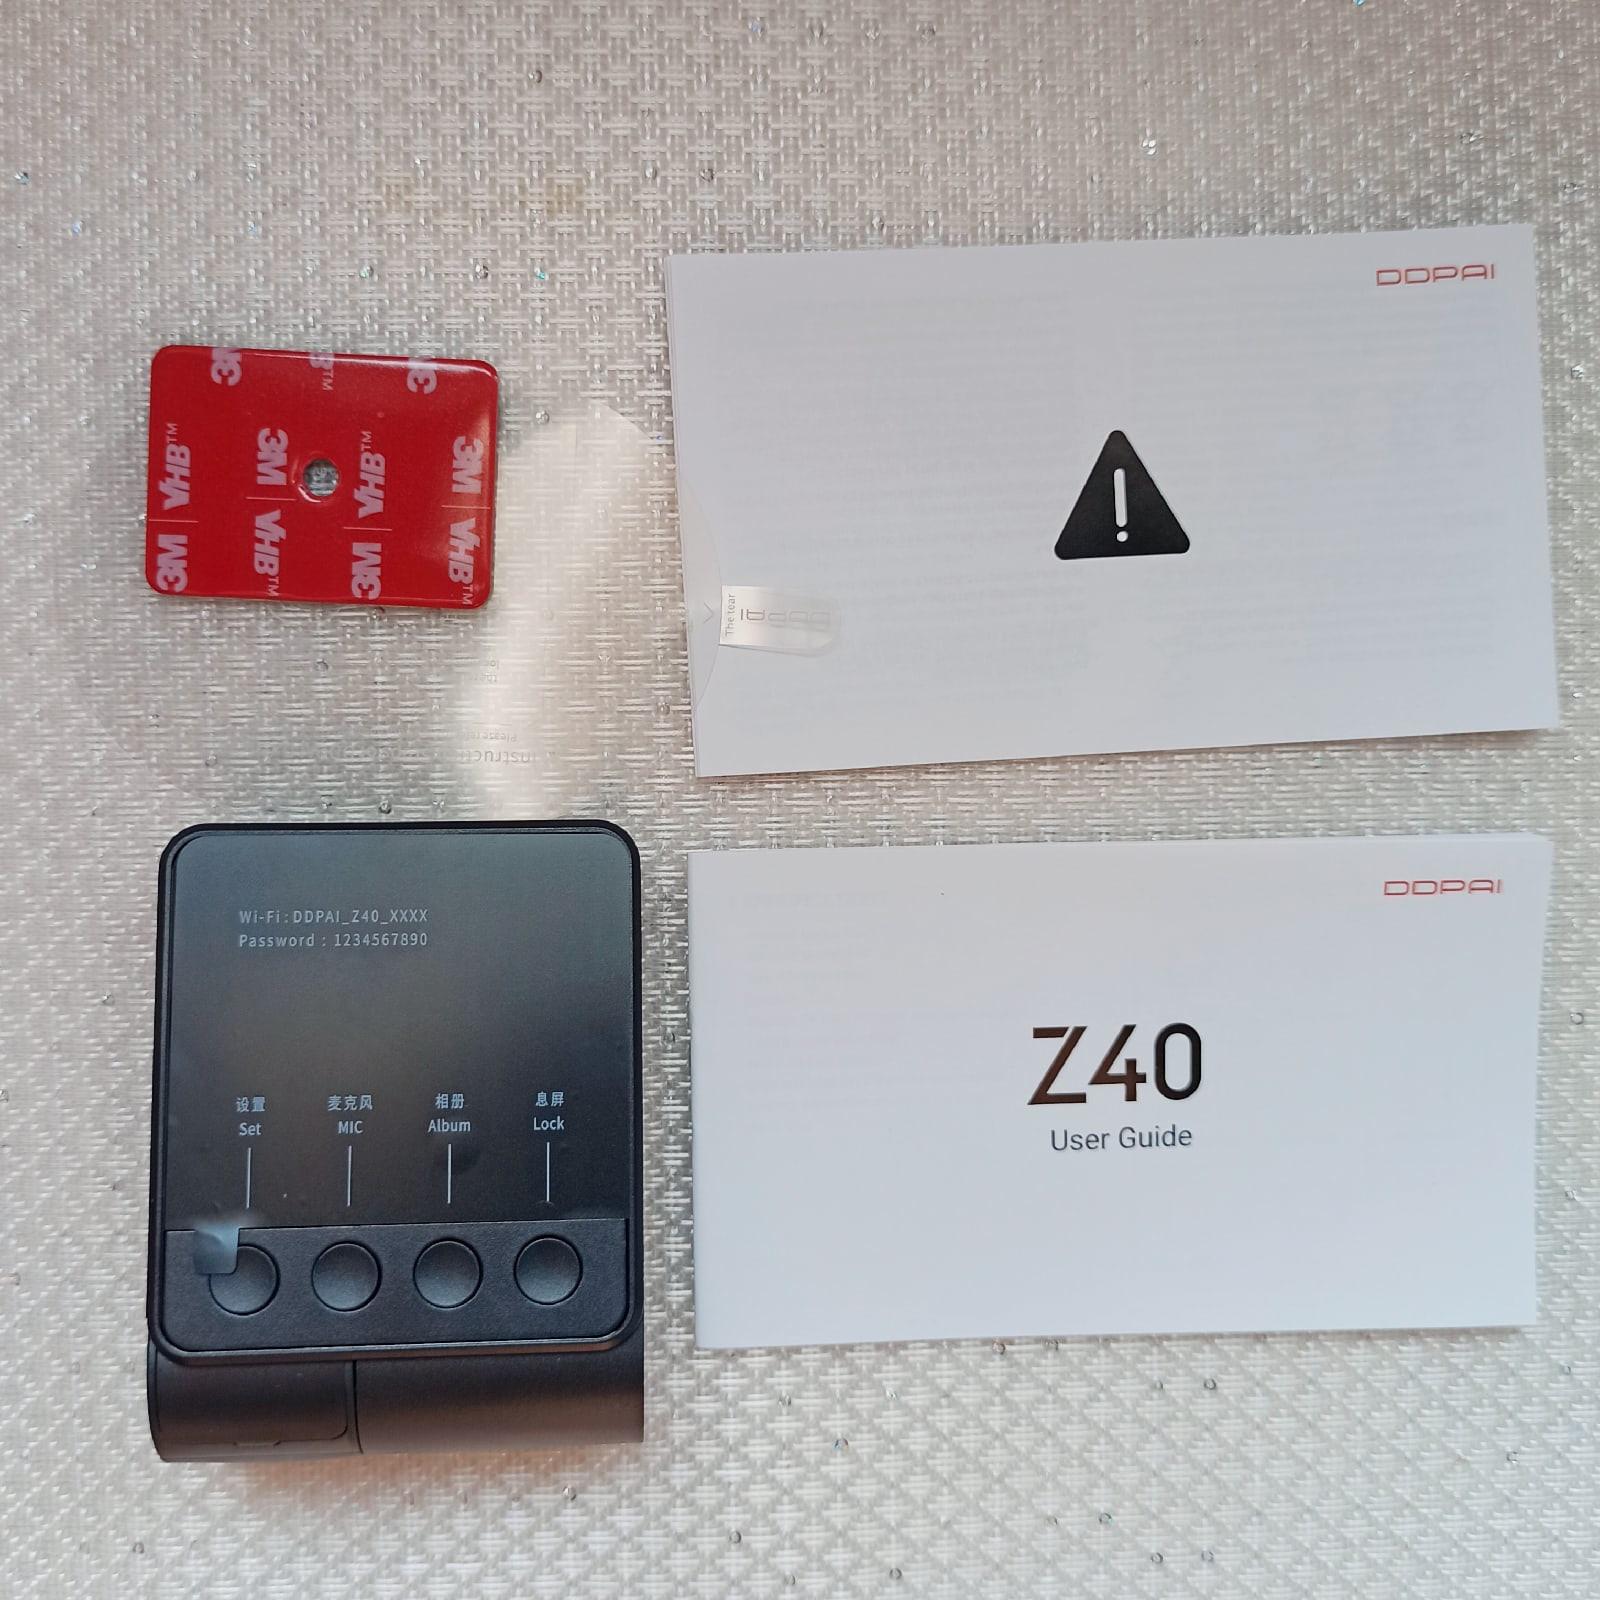 Обзор на видеорегистратор DDPAI Z40. Характеристика, комплектация - цена